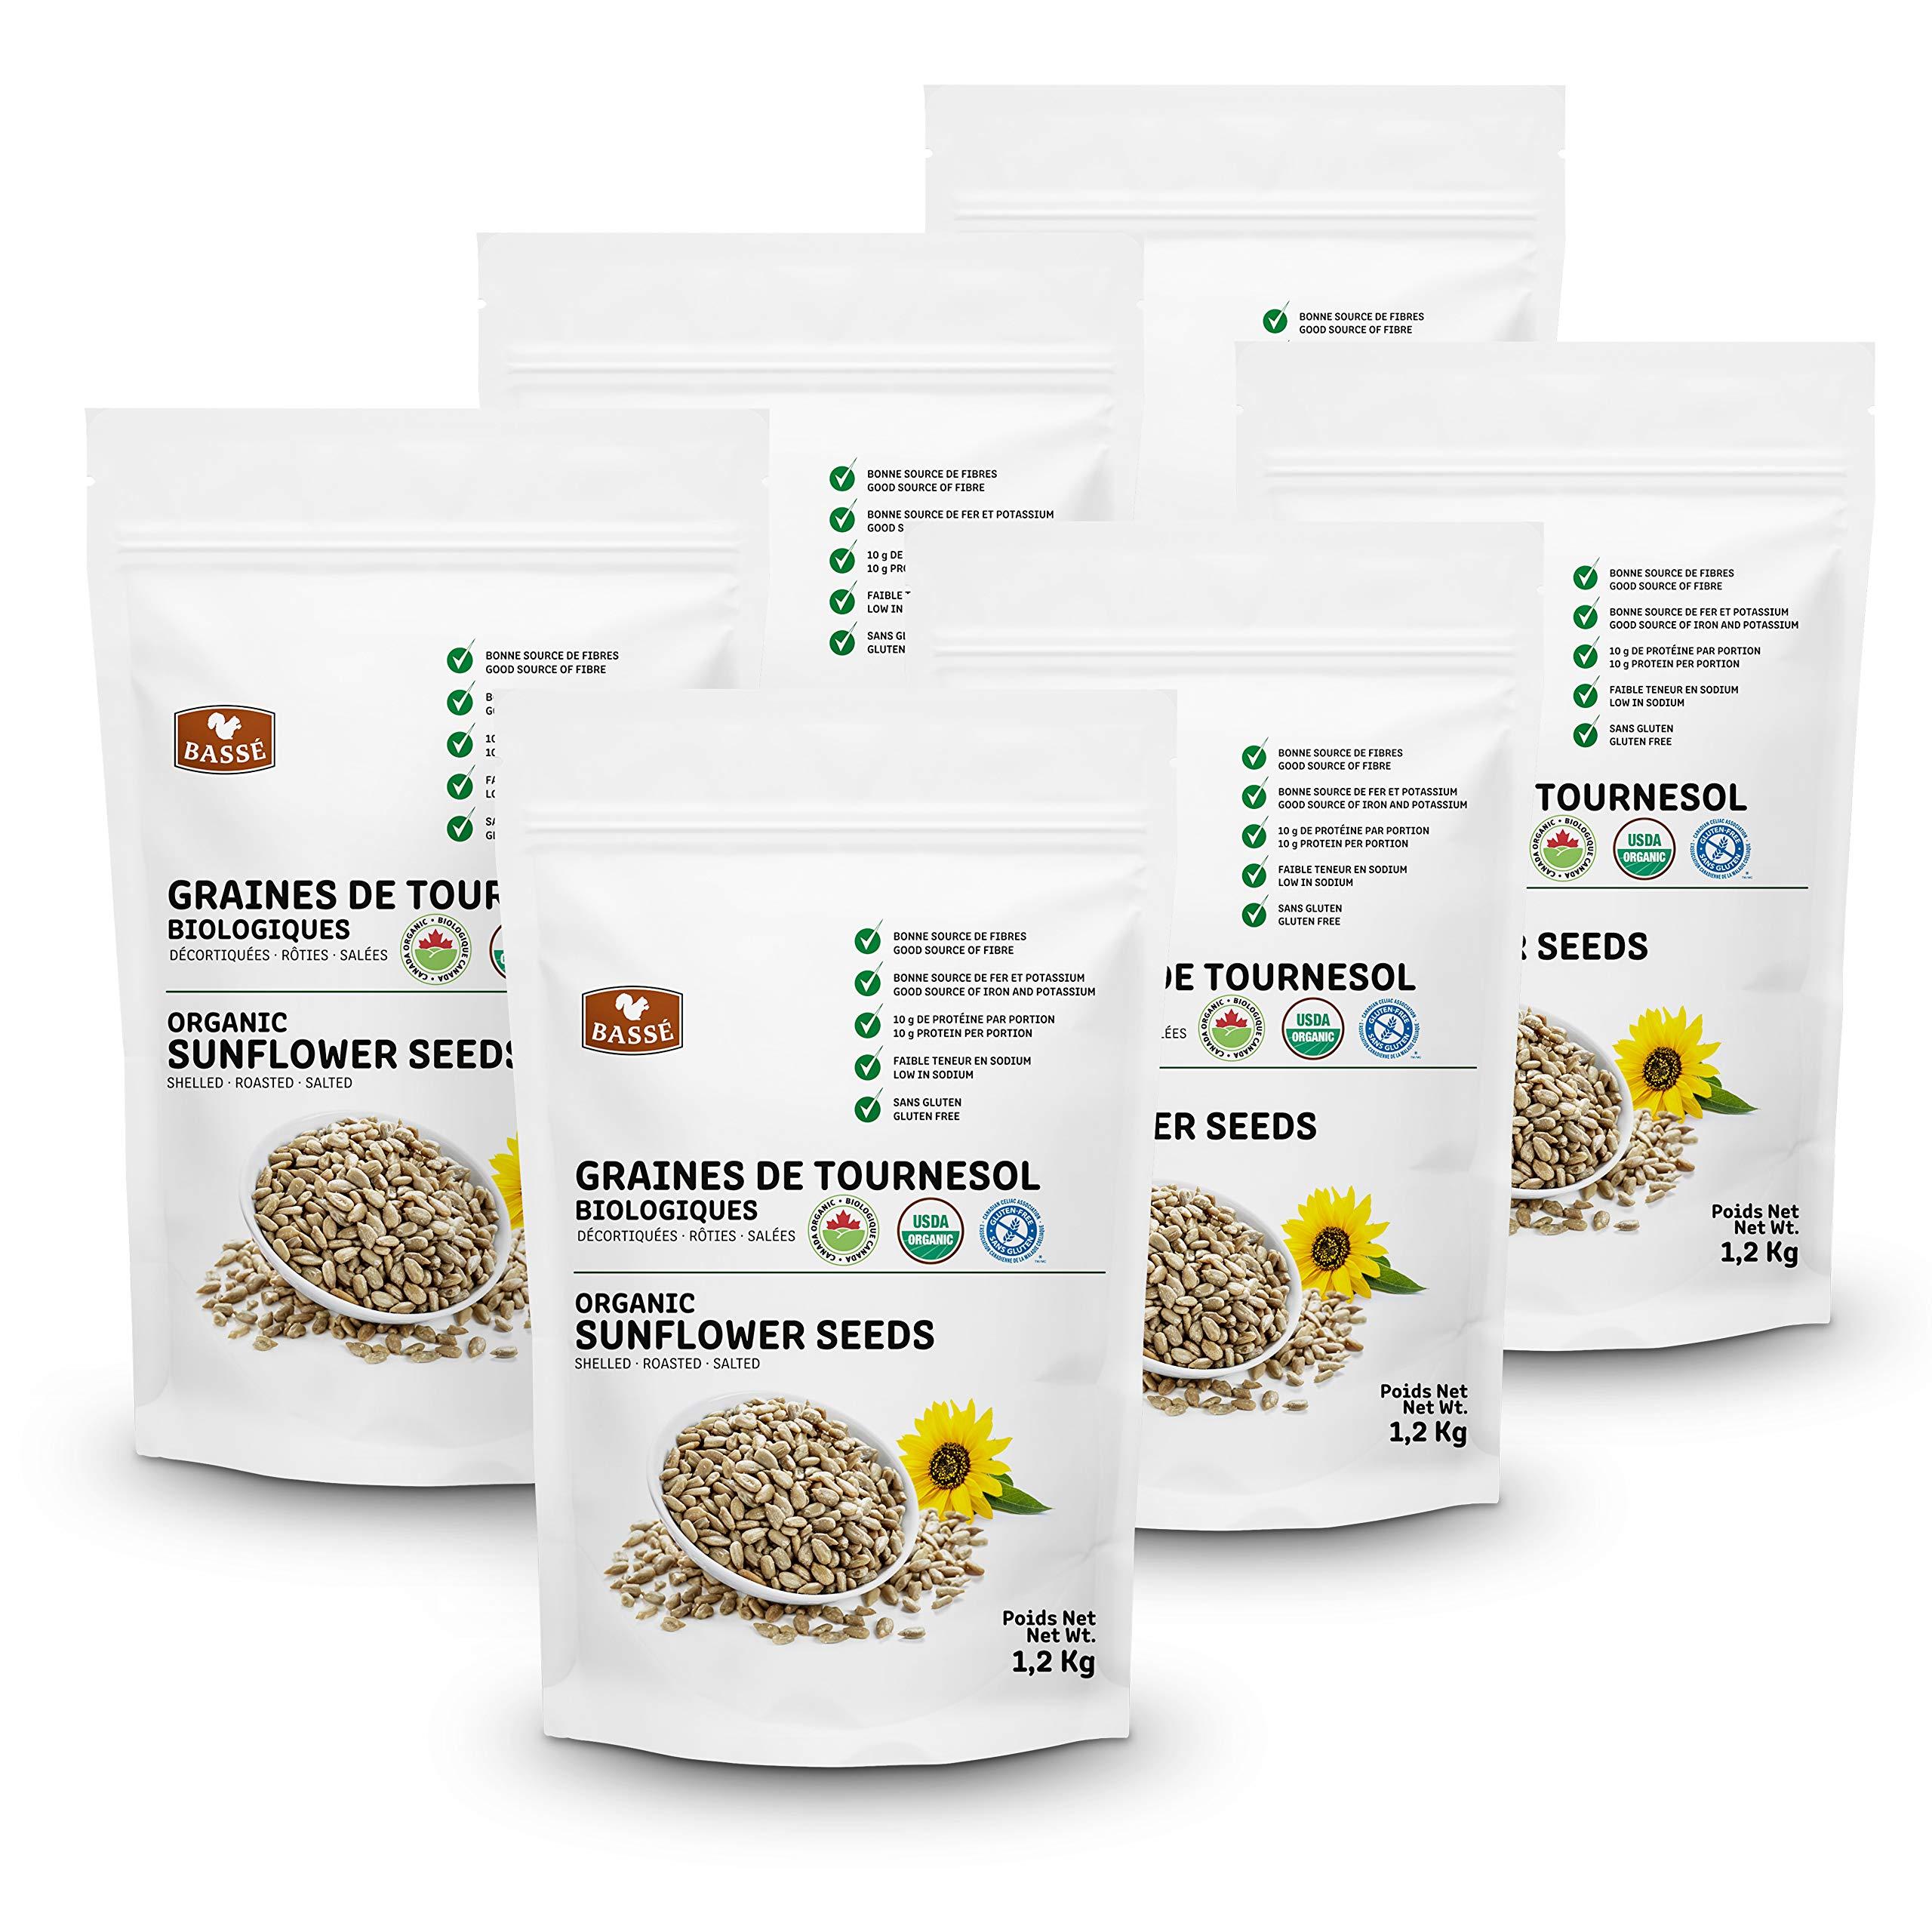 Basse Organic Sunflower Seeds, a Good Source of Fiber, Iron, and Potassium, Gluten Free – Kosher Certified 15.84 lb